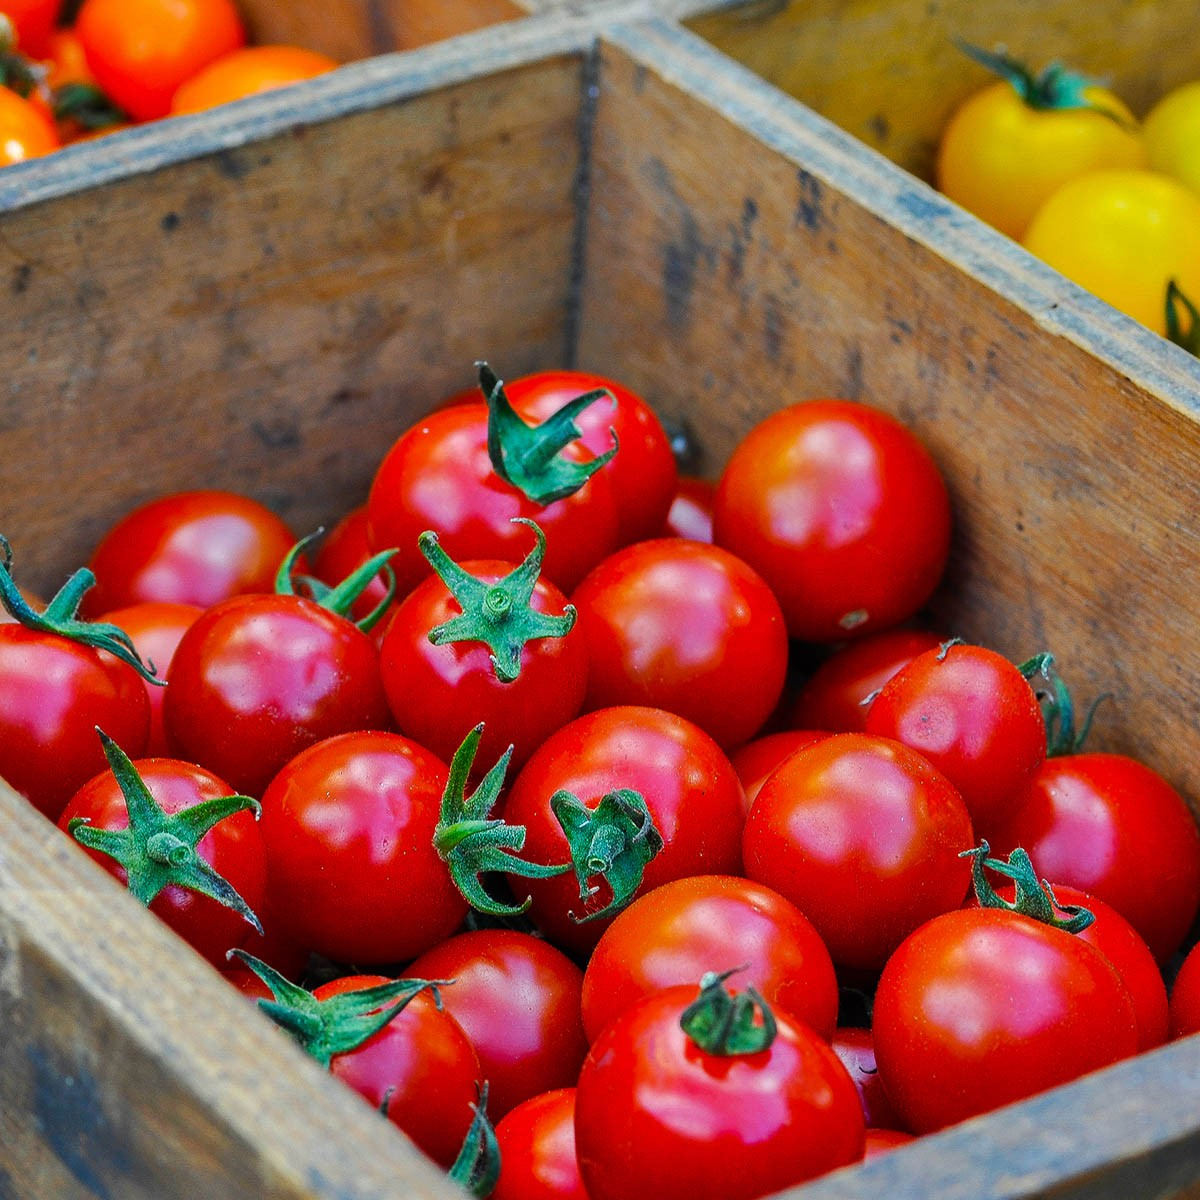 Tomate 'Solena® Sweet Red' (veredelt) rote Nektar-Cherrytomate